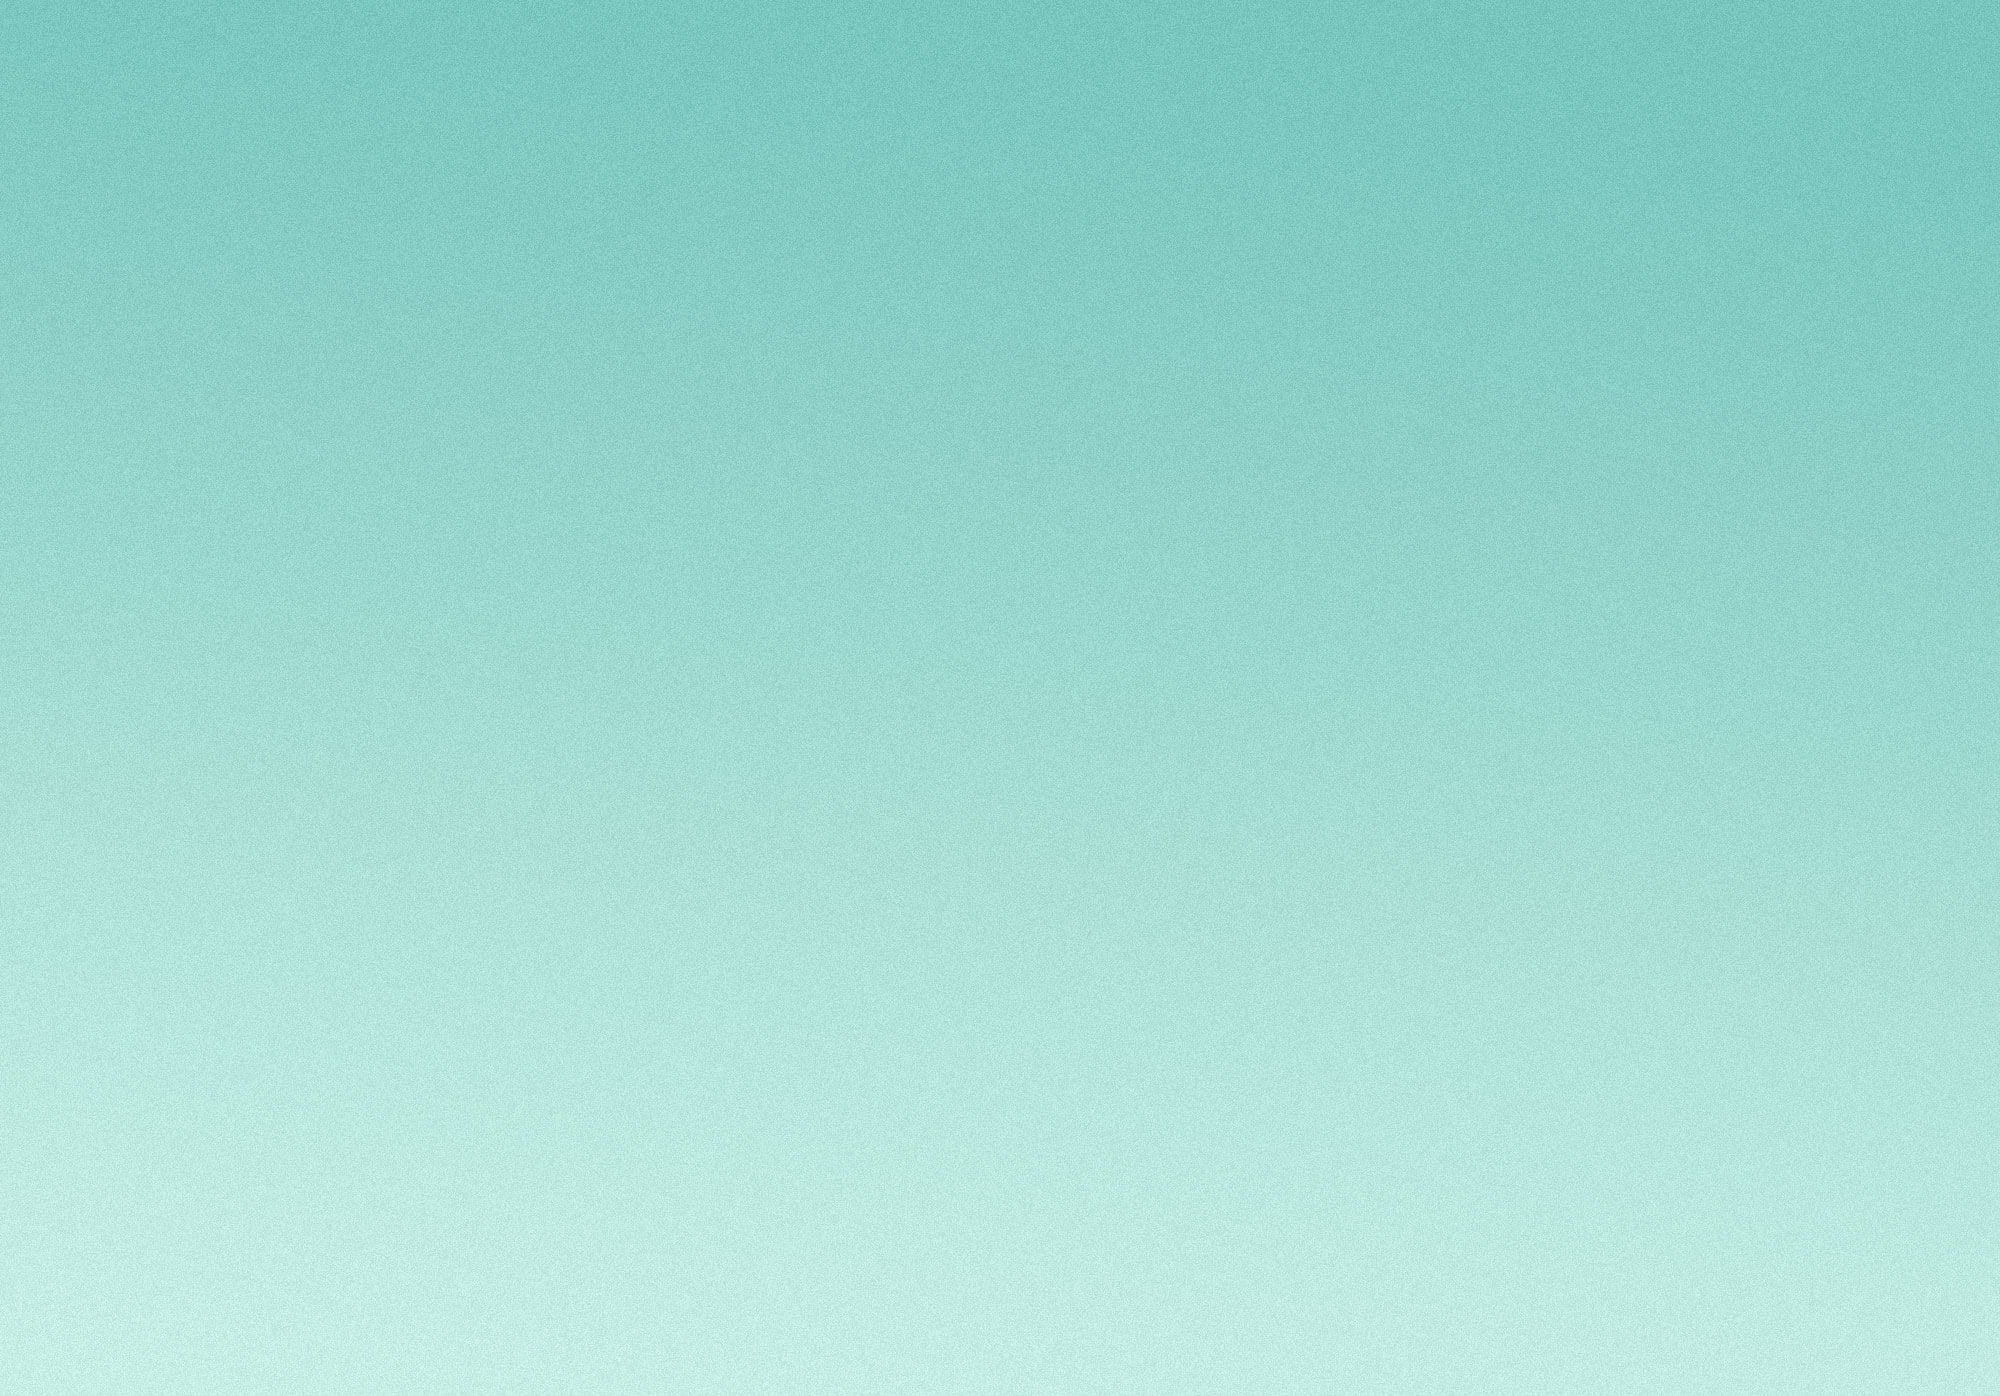 Background shape, green gradient